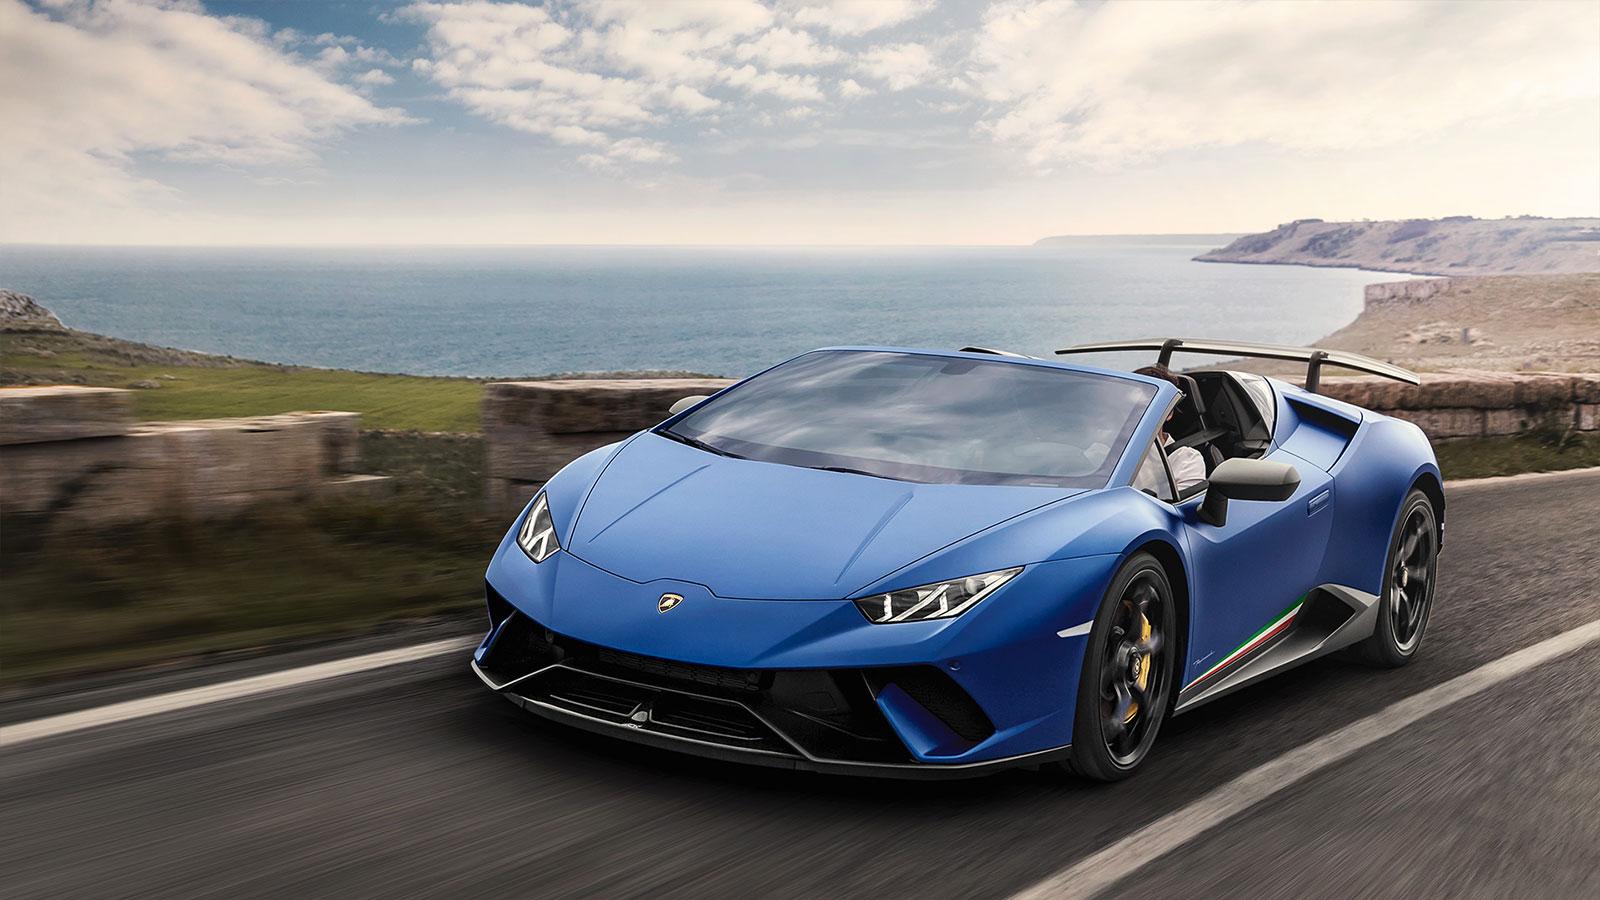 Lamborghini Huracan Performante Spyder - Vivid Technology image 2